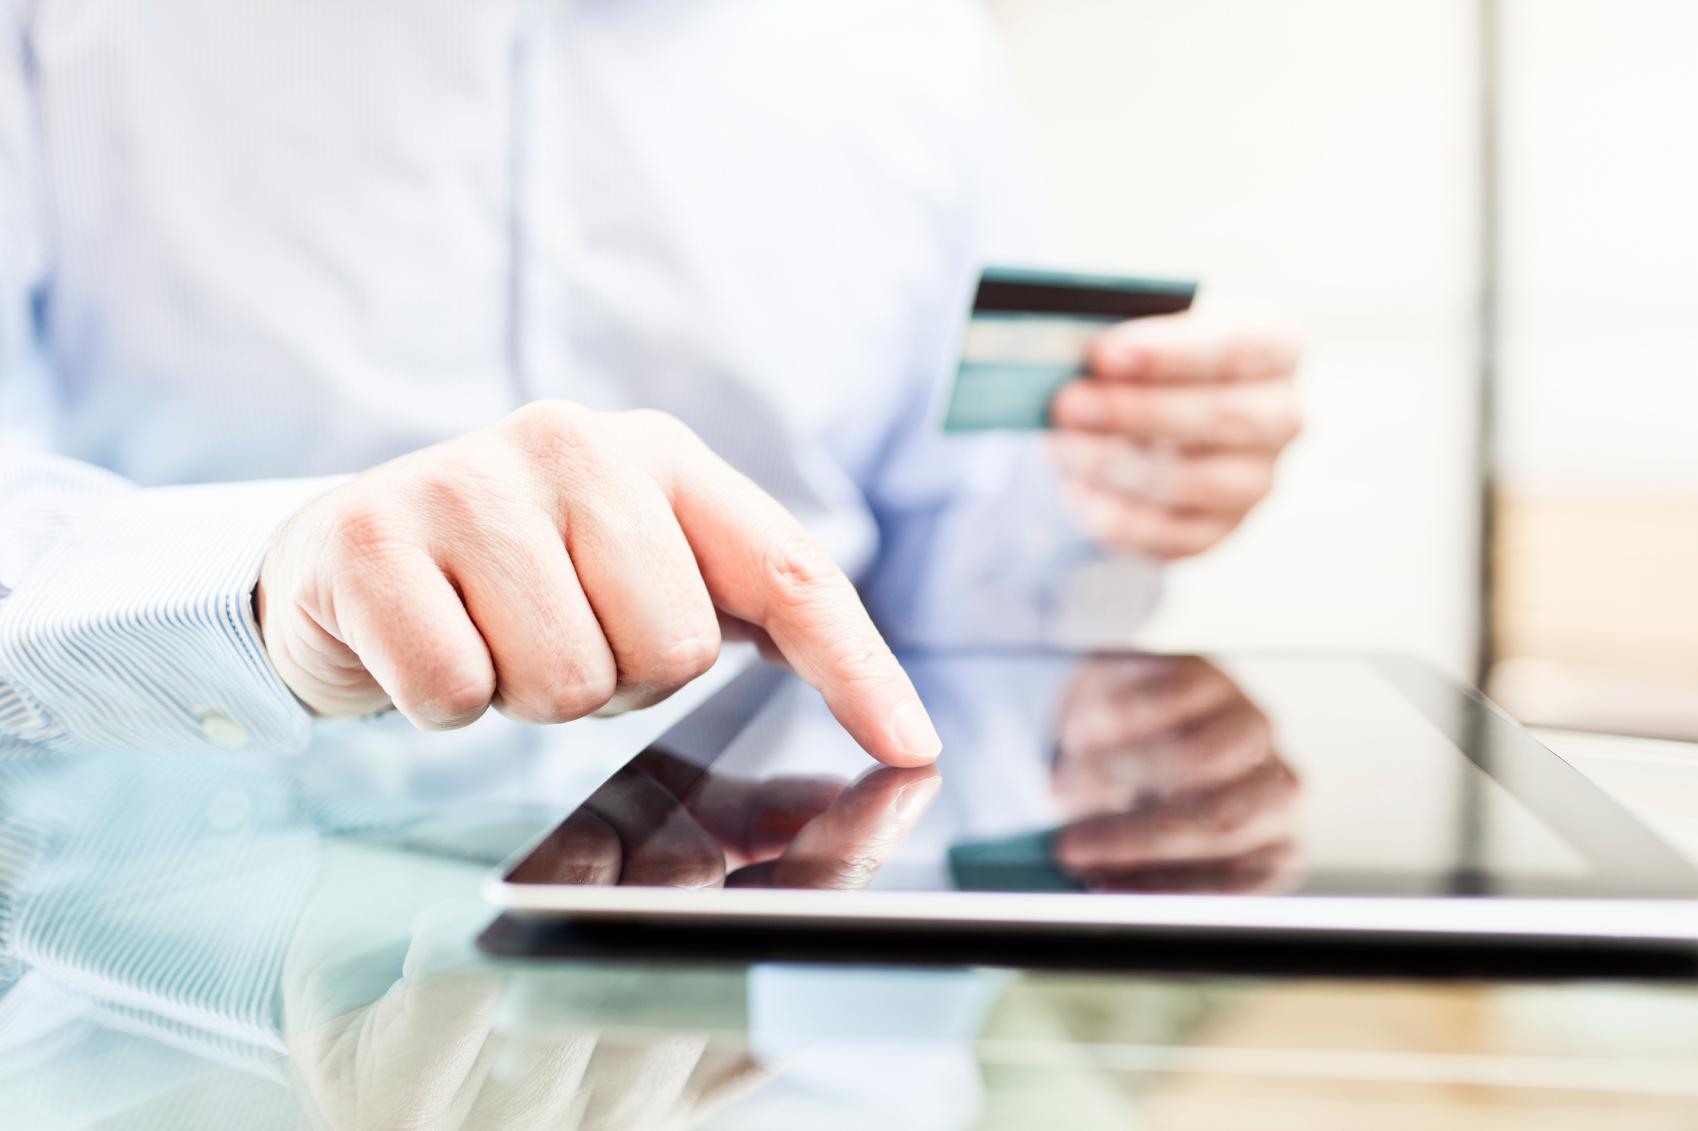 motivos-para-possuir-uma-loja-online